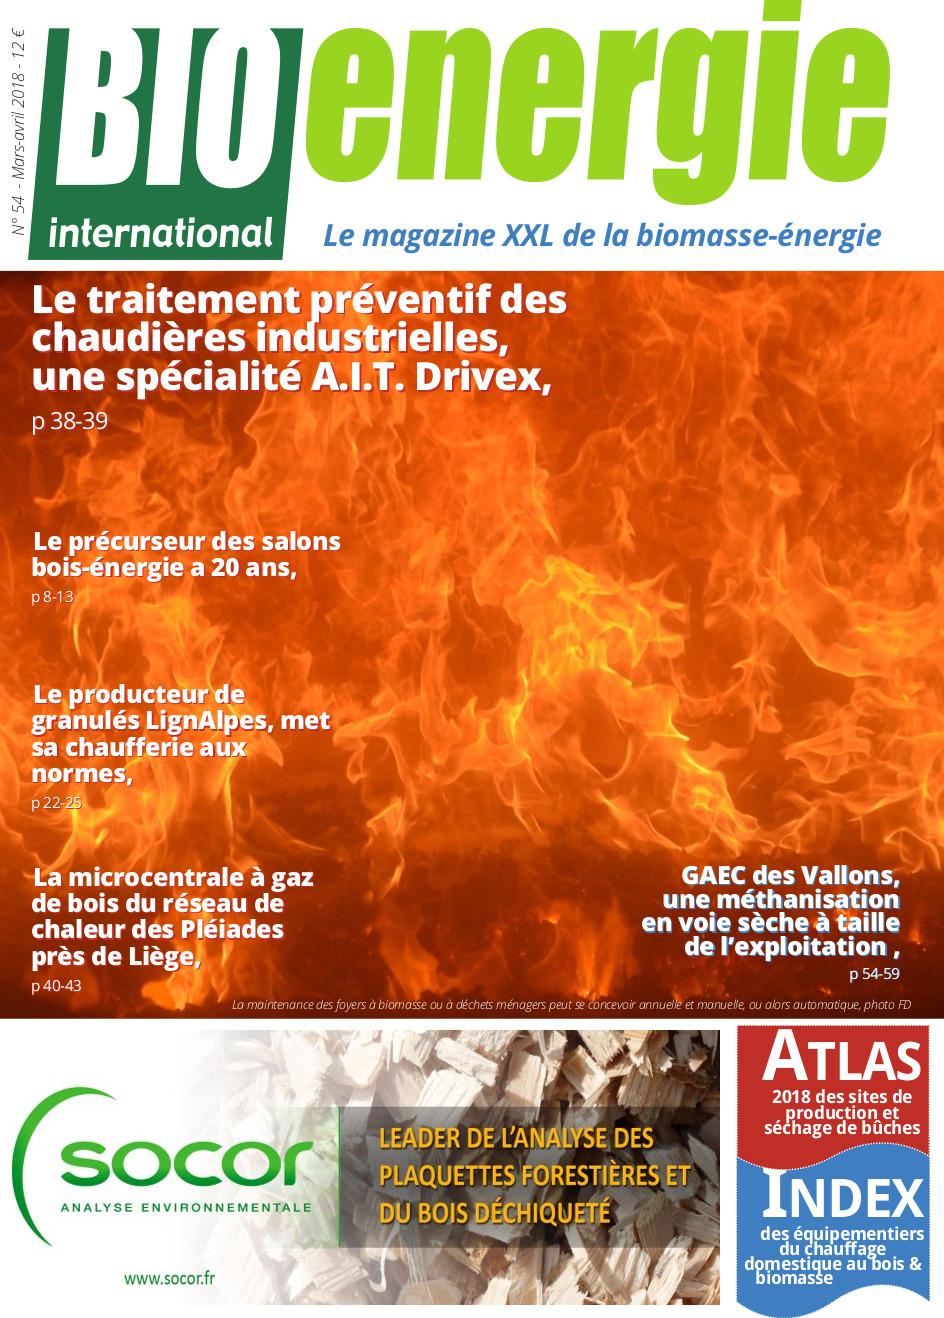 Bioénergie international n°54 – Mars – avril 2018